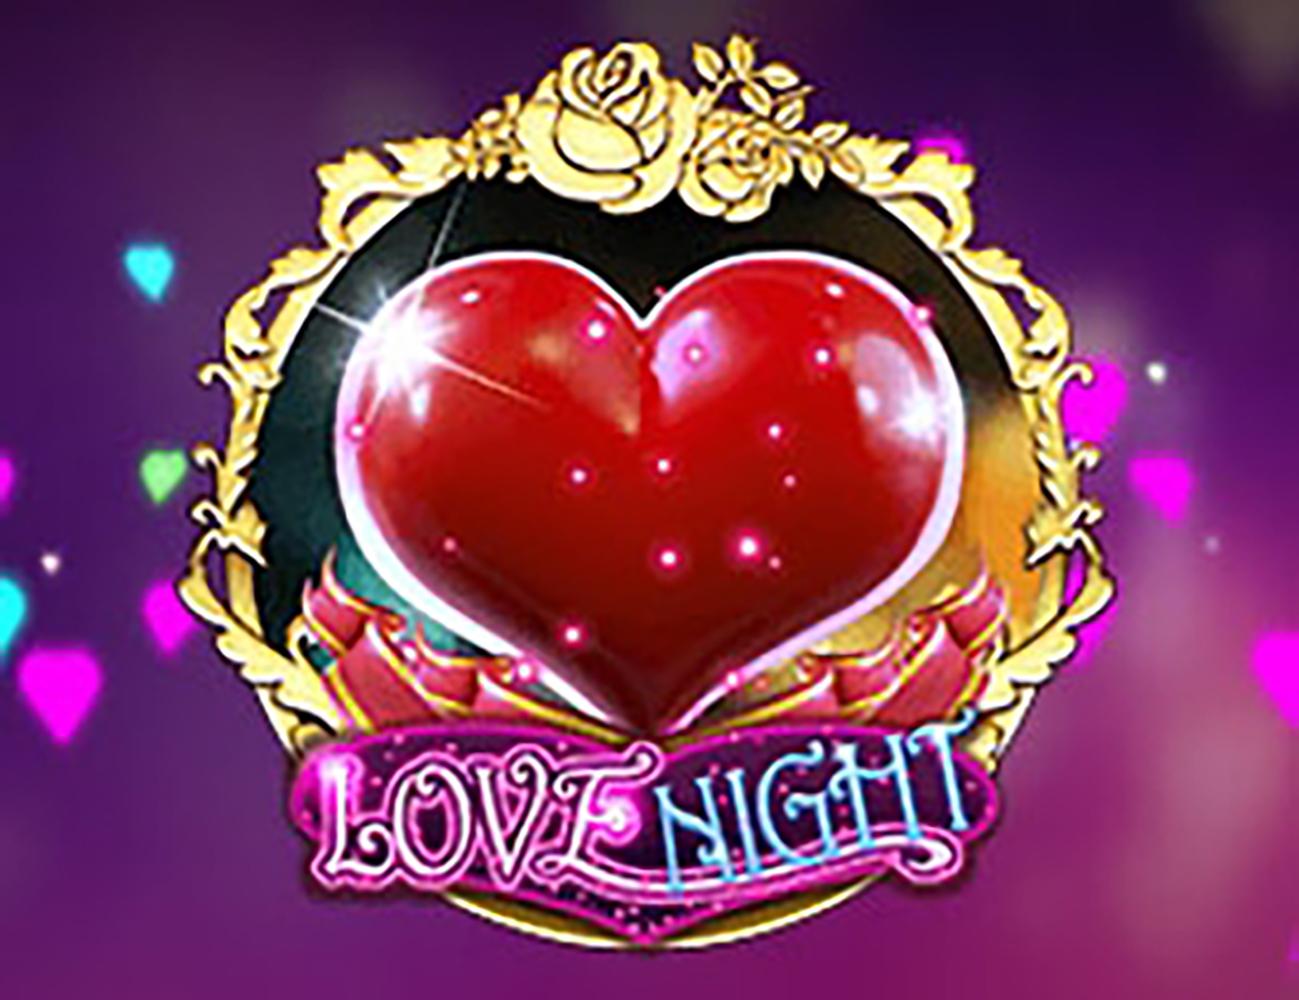 Love-Night